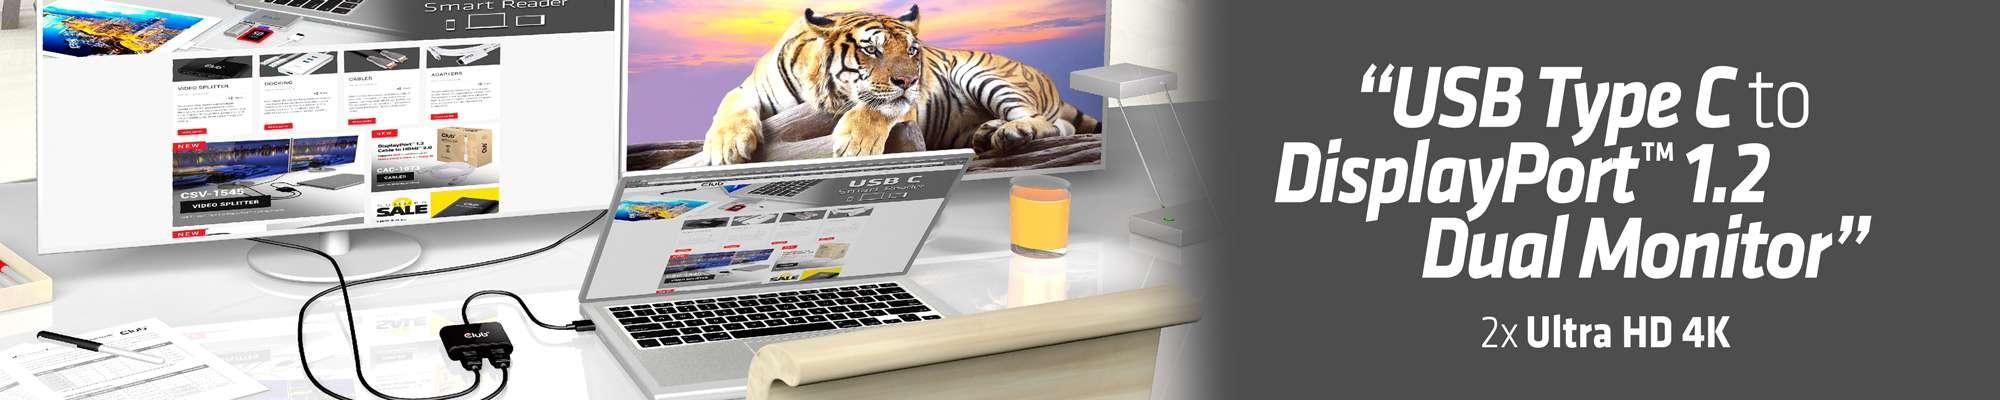 Club 3D | SenseVision MST Hub USB 3 1 Gen1 Type C to